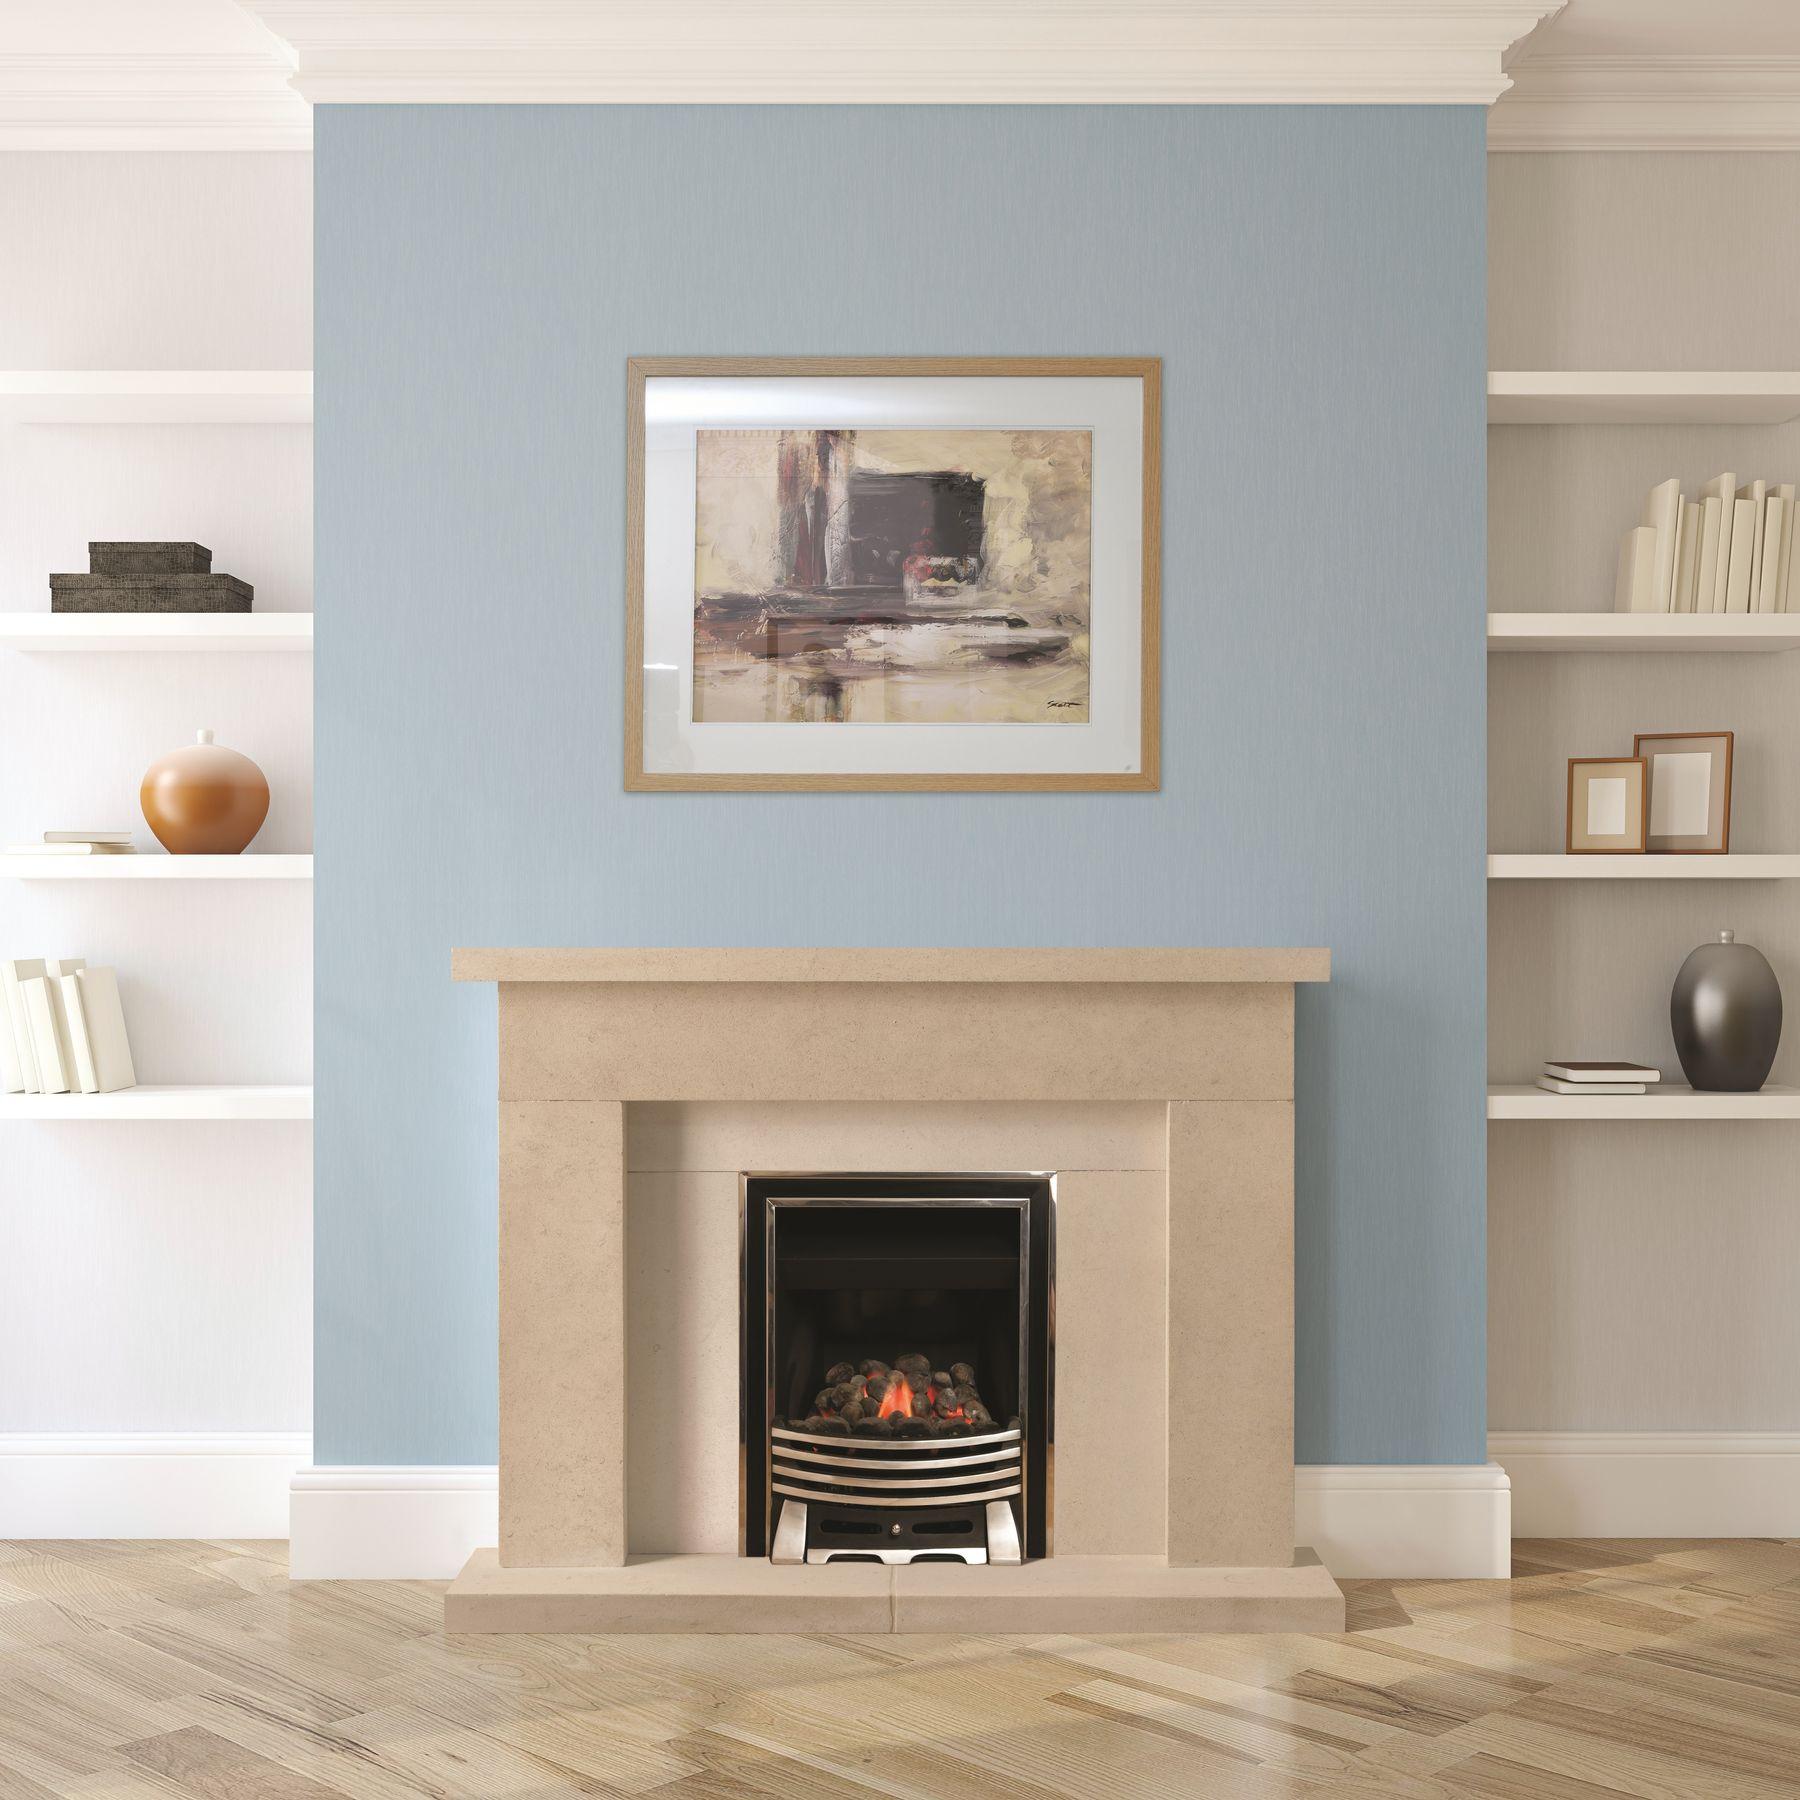 The Wedmore Bathstone Fireplace